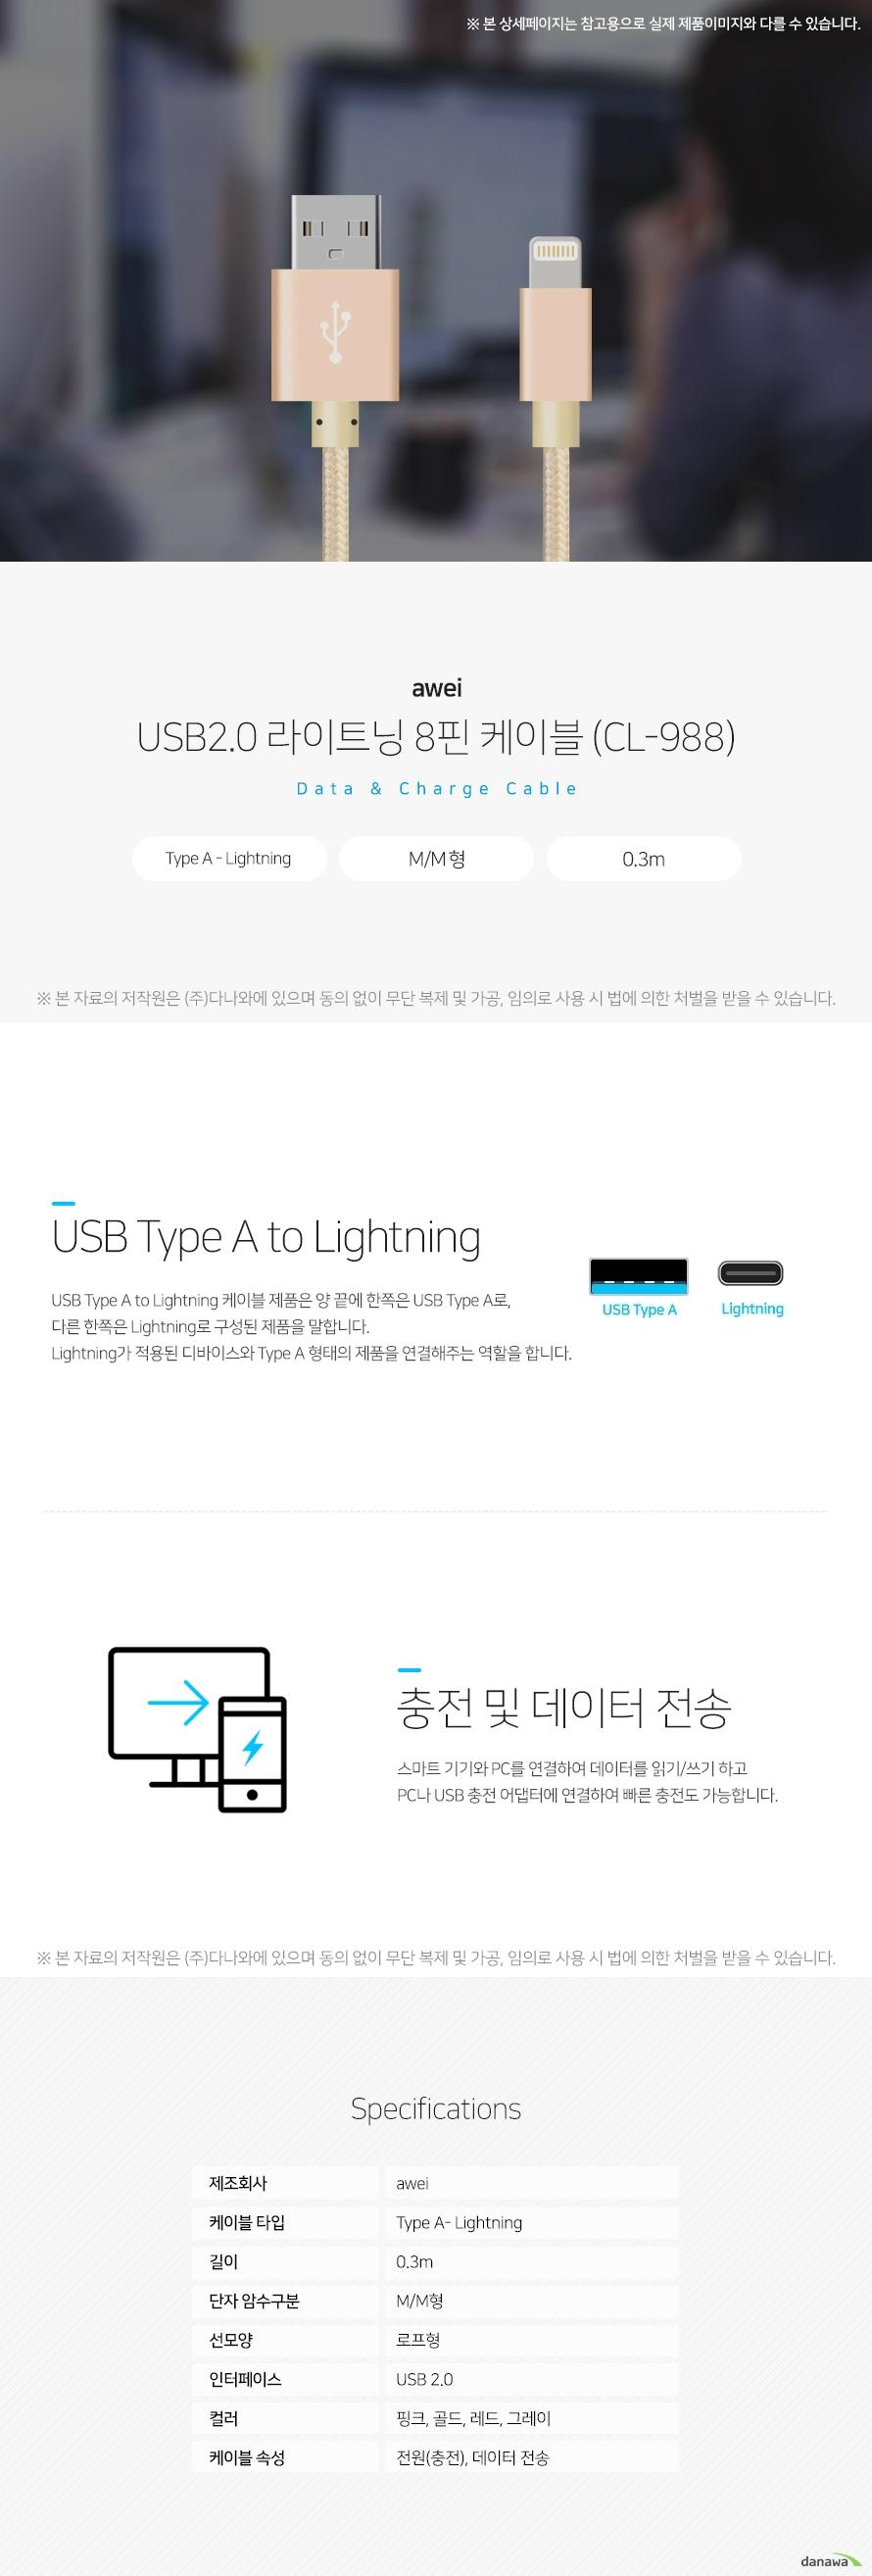 awei USB2.0 라이트닝 8핀 케이블 (CL-988) USB Type A to Lightning USB Type A to Lightning 케이블 제품은 양 끝에 한쪽은 USB Type A로, 다른 한쪽은   Lightning로 구성된 제품을 말합니다. Lightning가 적용된 디바이스와 Type A 형태의   제품을 연결해주는 역할을 합니다.  충전 및 데이터 전송 스마트 기기와 PC를 연결하여 데이터를 읽기/쓰기 하고 PC나 USB 충전 어댑터에 연결  하여 빠른 충전도 가능합니다.  스펙 제조회사 awei 케이블타입 Type A - Lightning 길이 0.3m 단자 암수구분 M/M형 선모양 로프형 인터페이스 USB 2.0 컬러 핑크, 골드, 레드, 그레이 케이블 속성 전원(충전), 데이터 전송